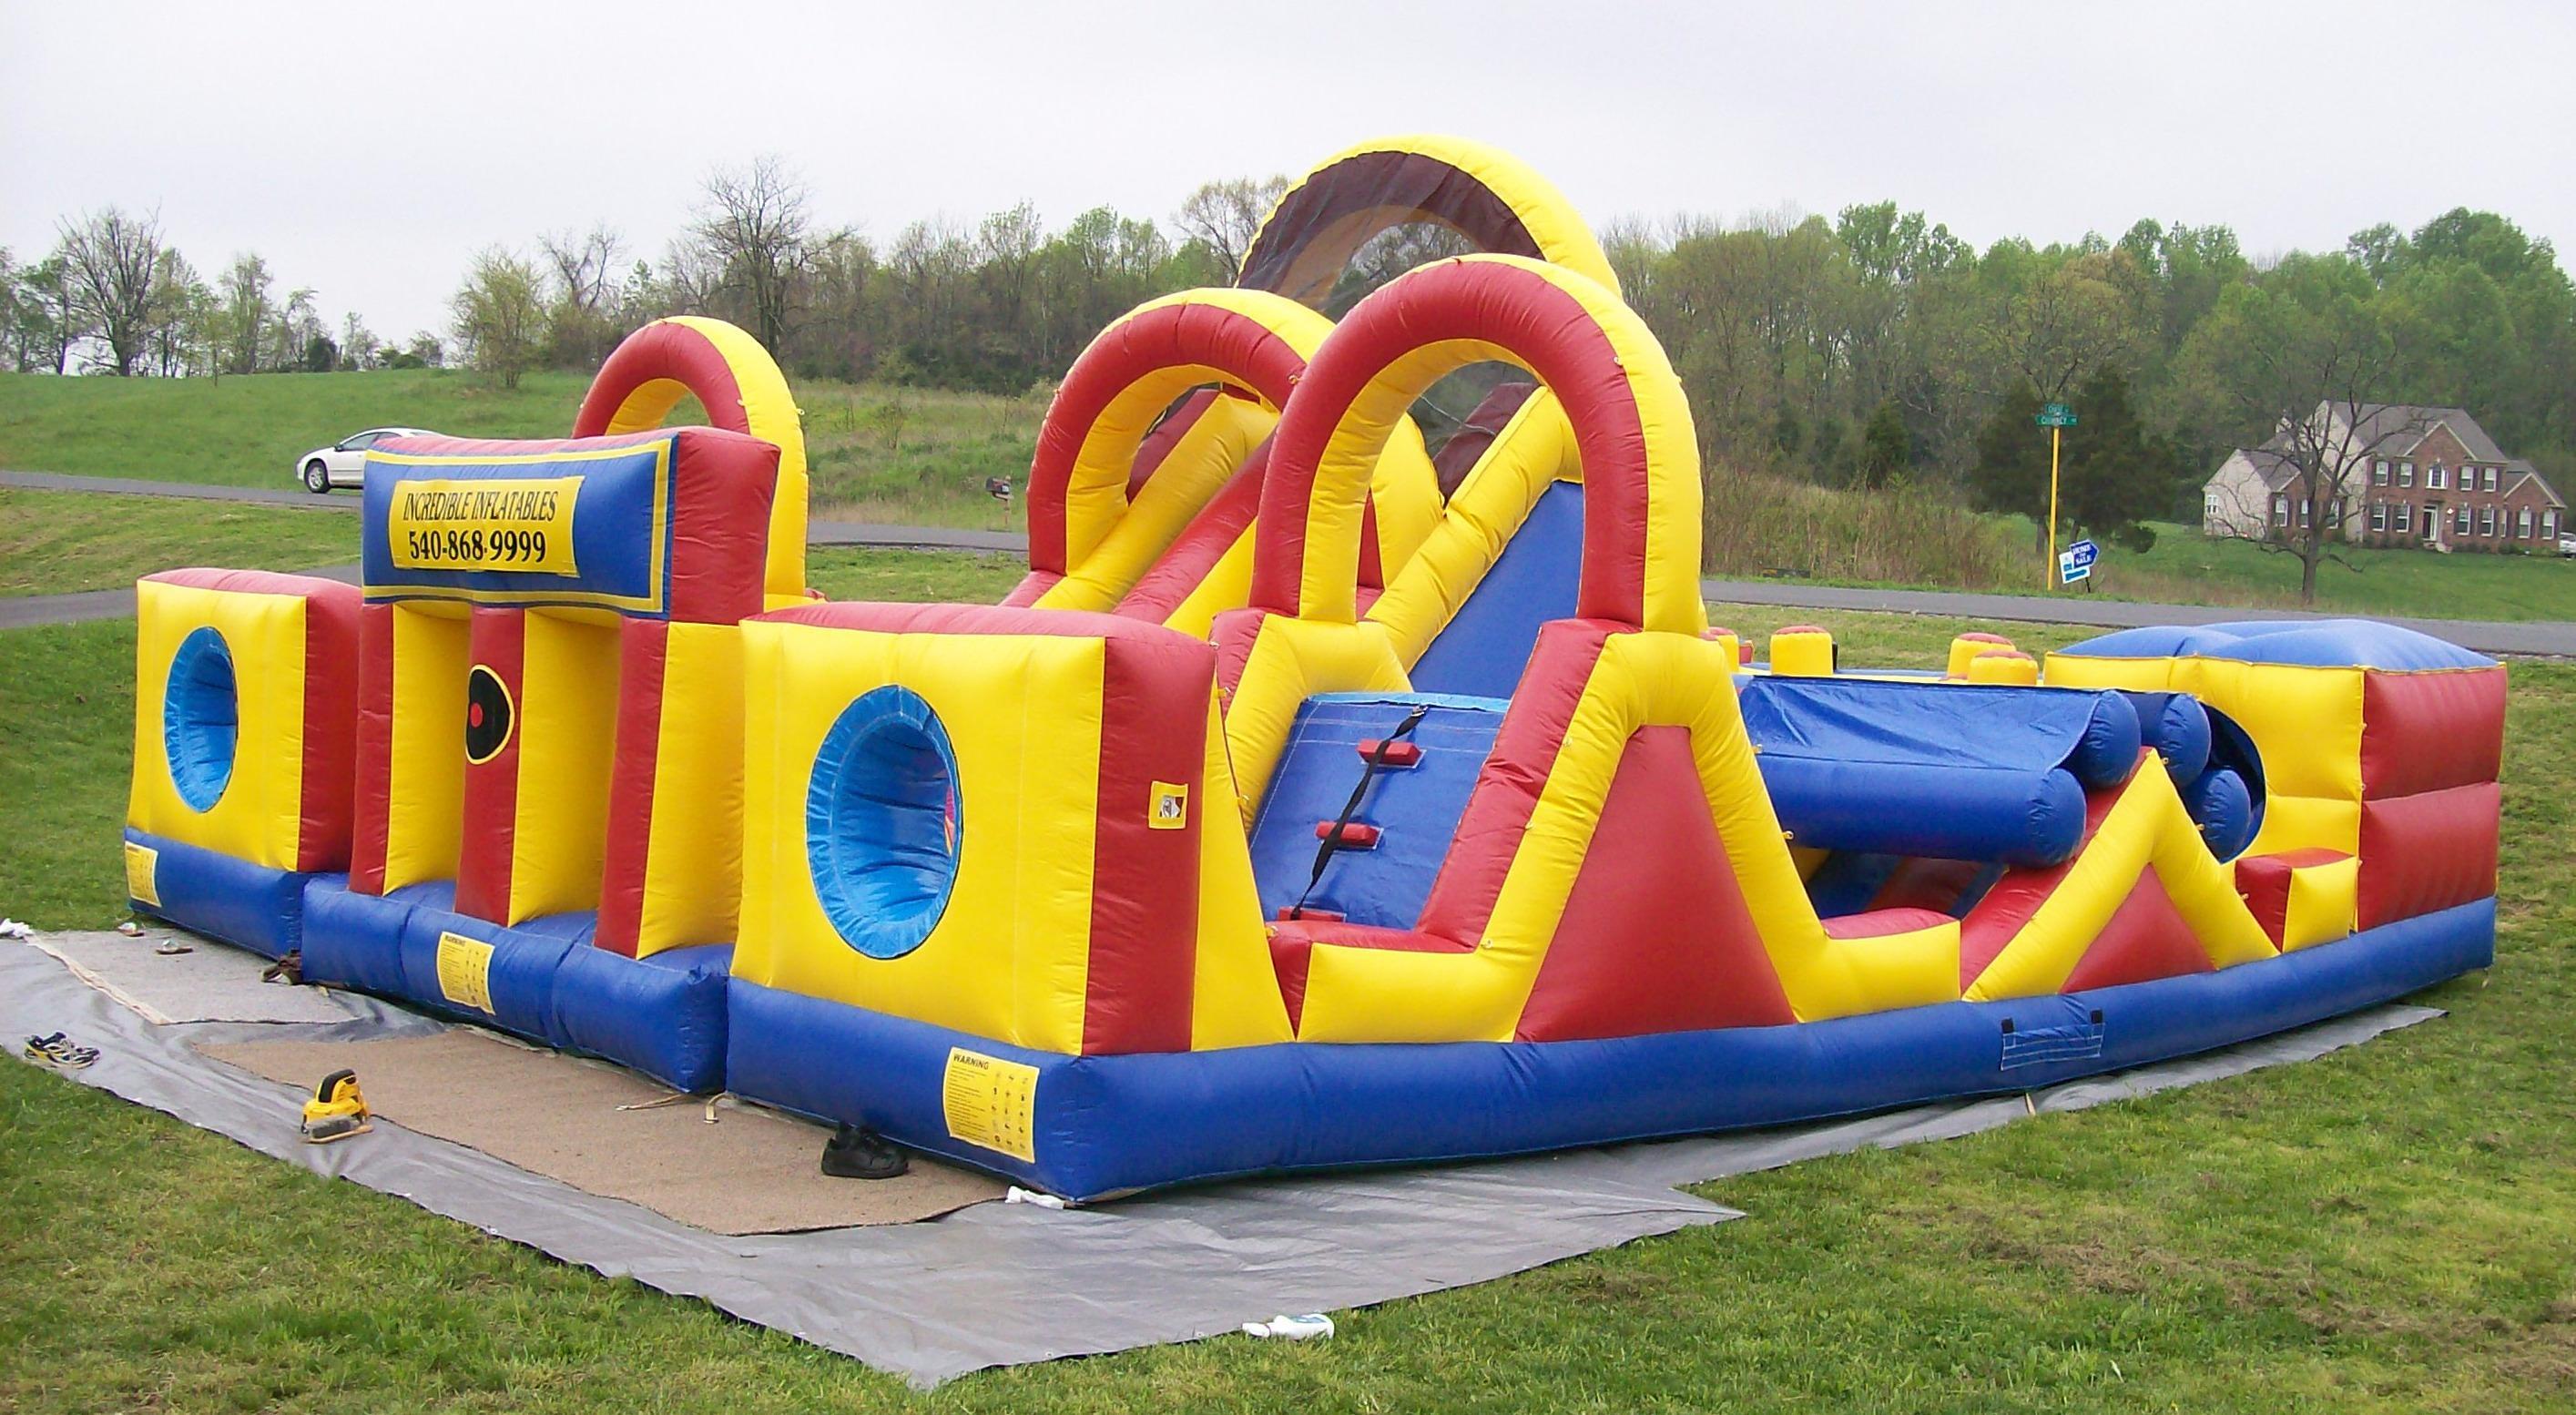 Incredible Inflatables LLC image 3